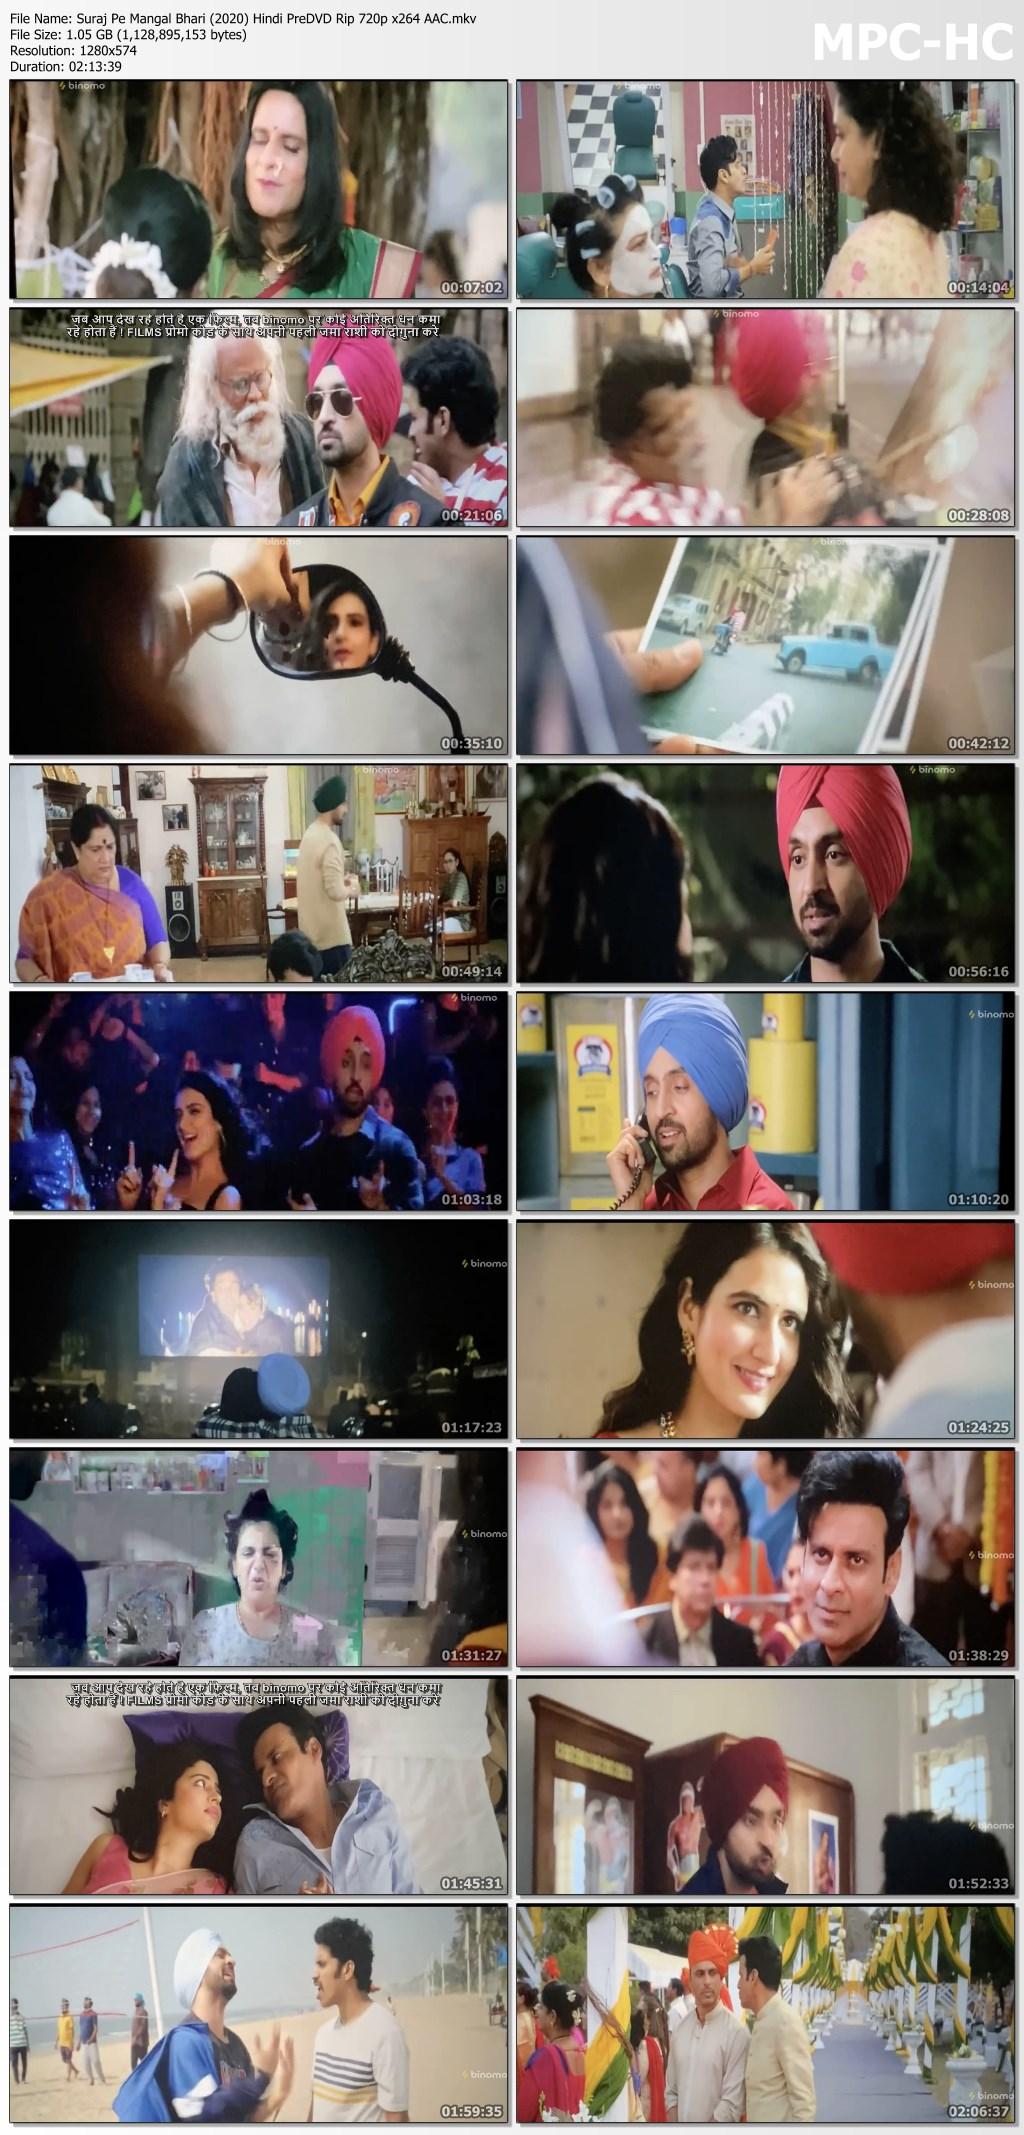 Suraj Pe Mangal Bhari (2020) Hindi PreDVD Rip 720p x264 AAC.mkv thumbs